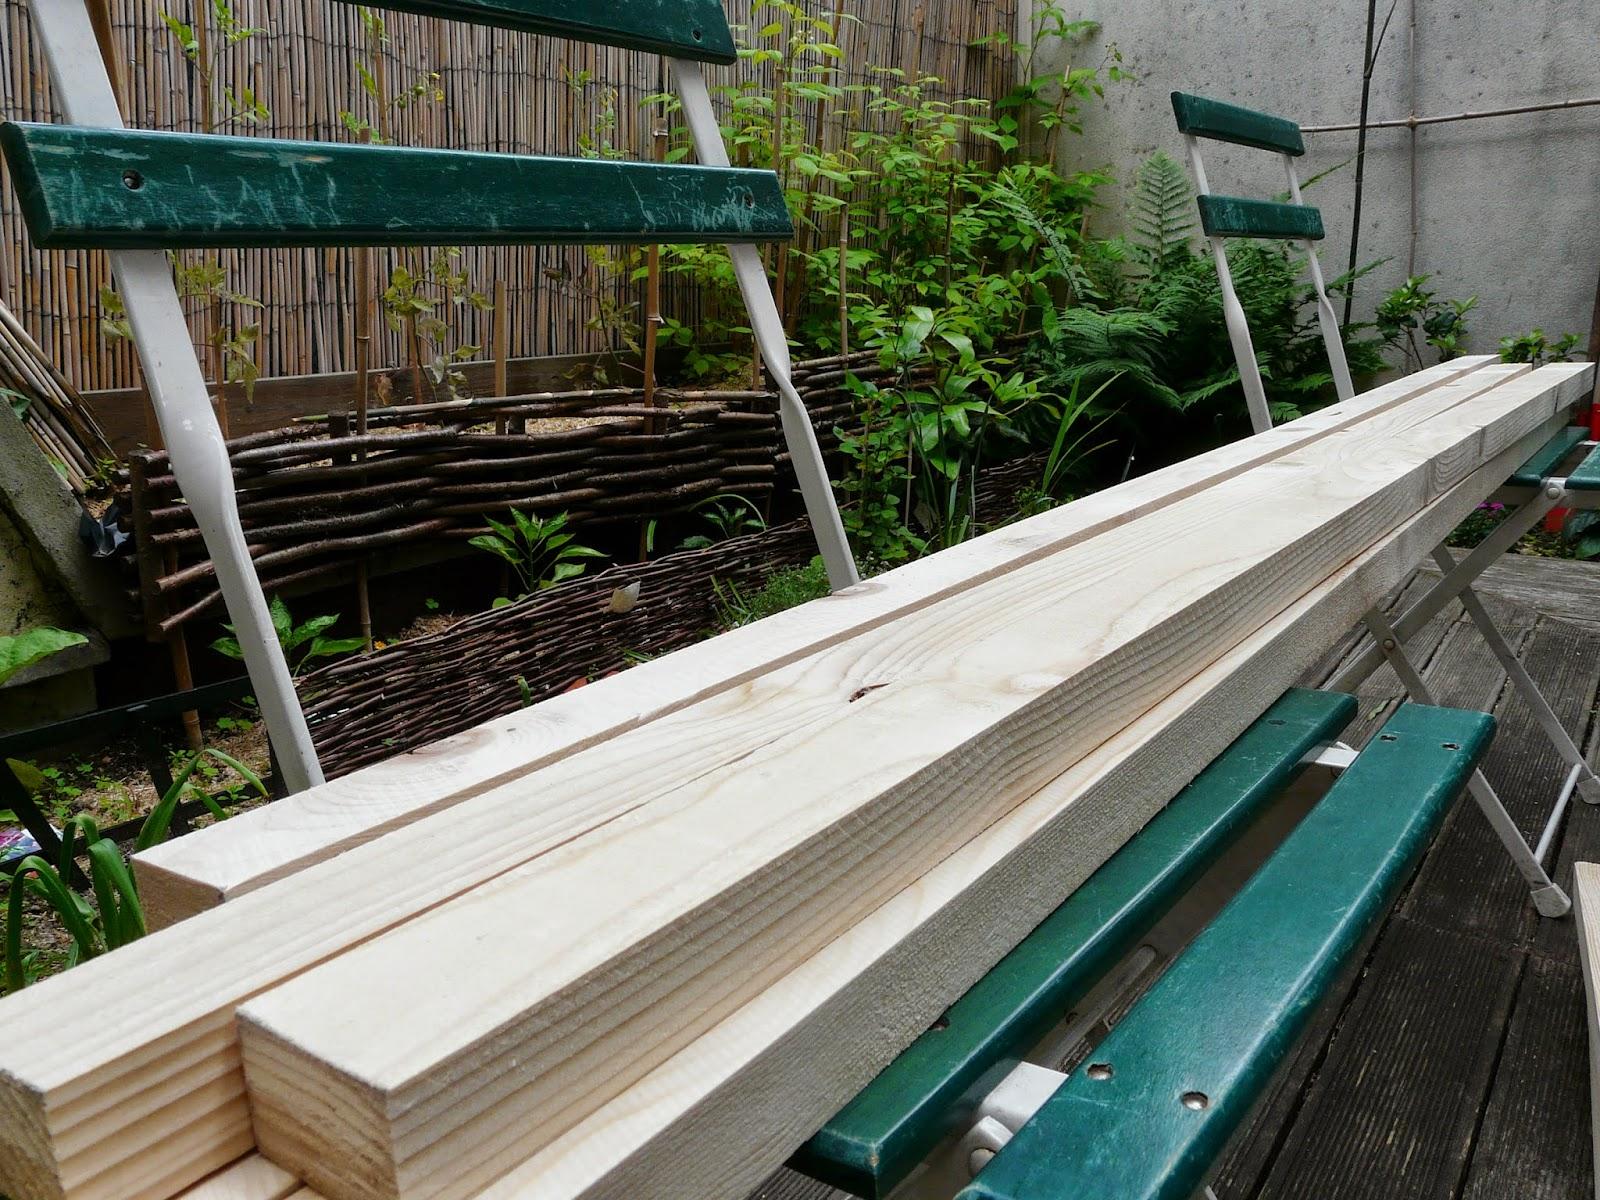 Tante Cath ... Le Blog !: Diy Construire Sa Cabane De Jardin intérieur Fabriquer Cabane De Jardin